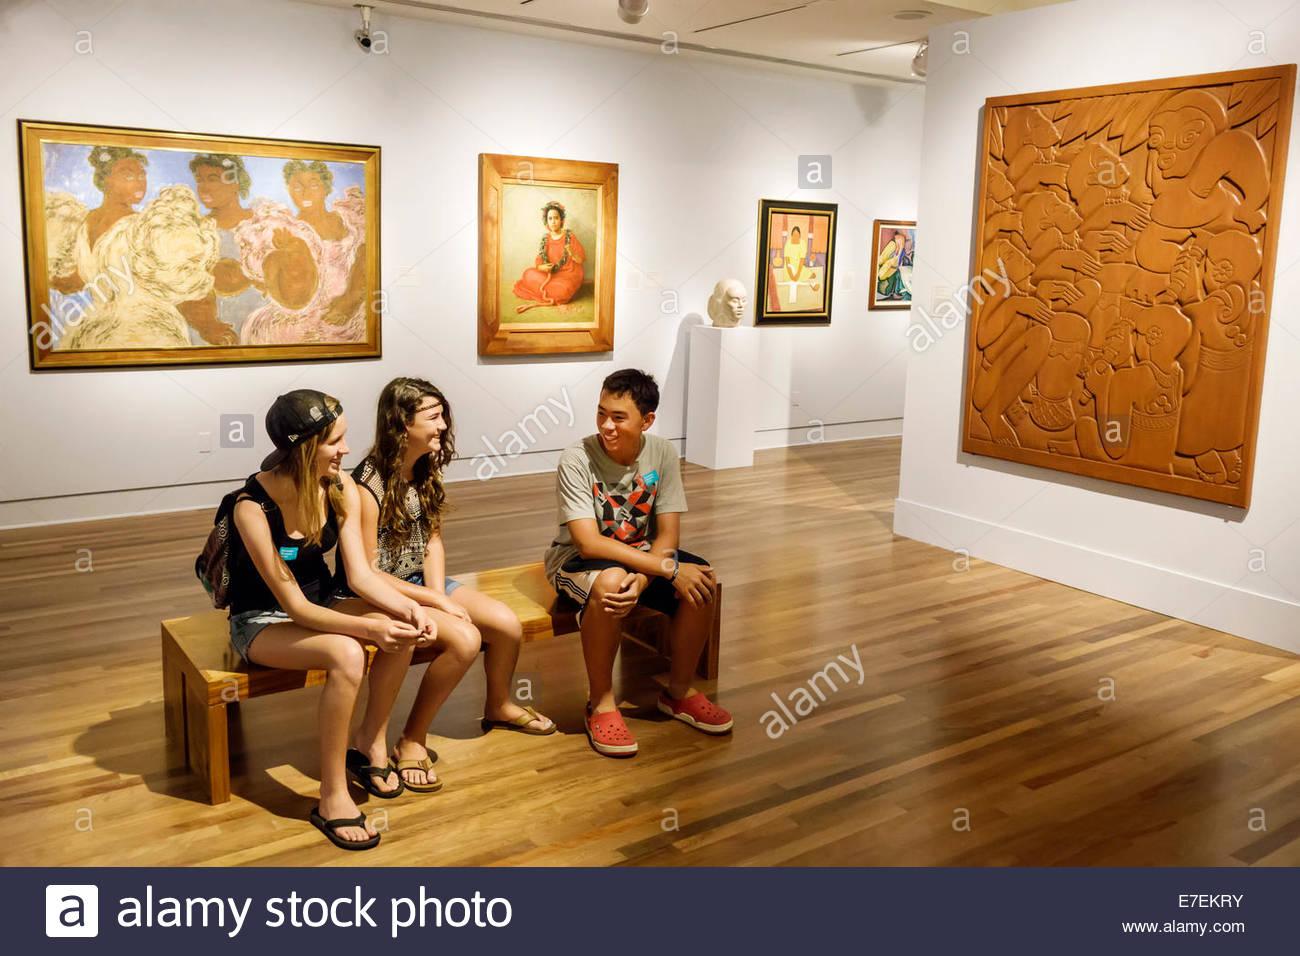 Hawaii Hawaiian Honolulu Museum Of Art Inside Interior Paintings Gallery Teen Asian Boy Girl Friends